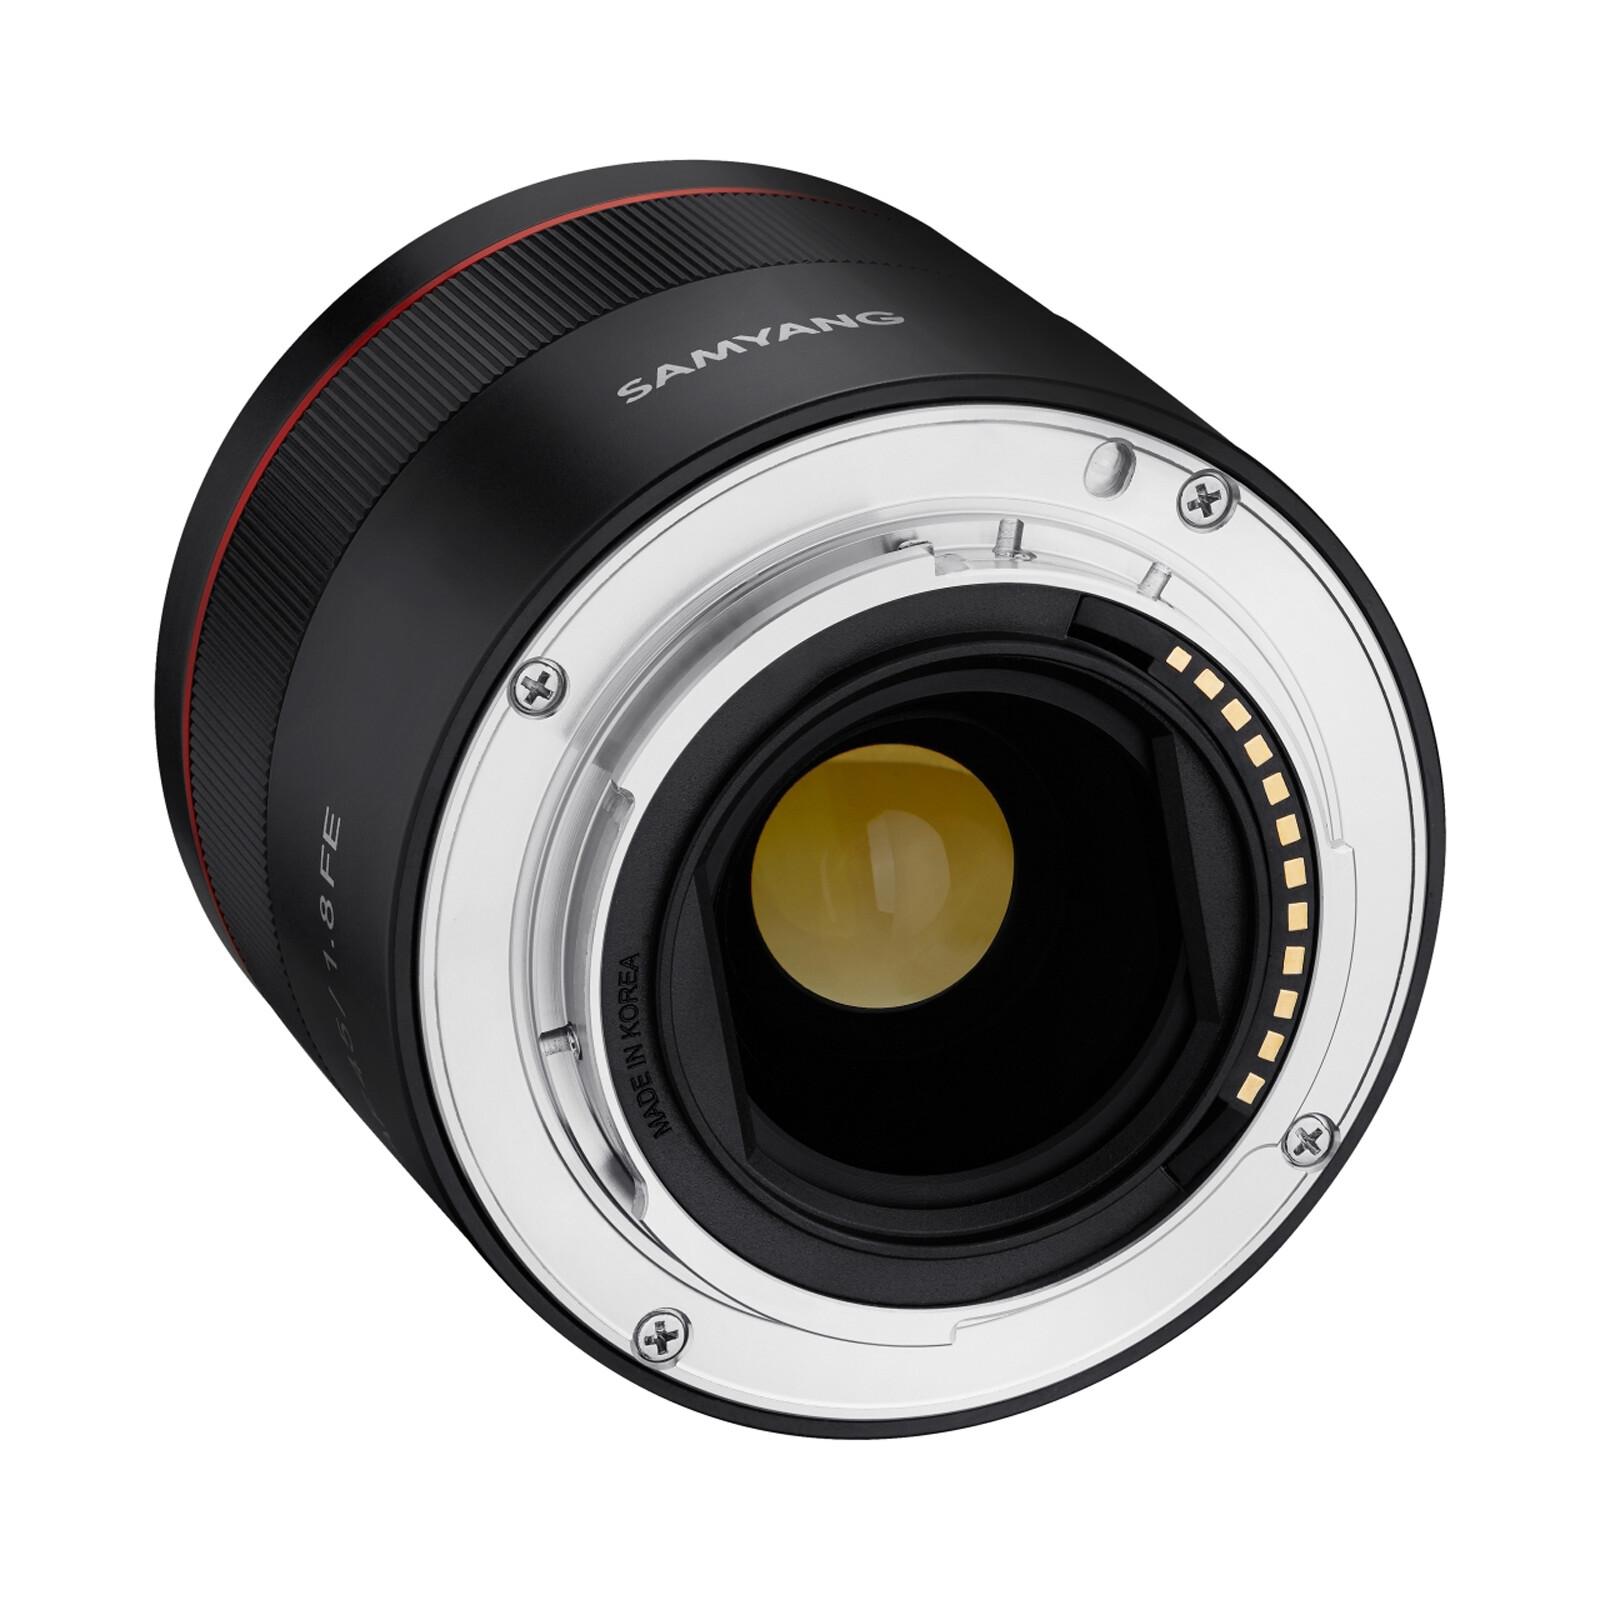 Samyang AF 45/1,8 FE für Sony E - Tiny but Premium